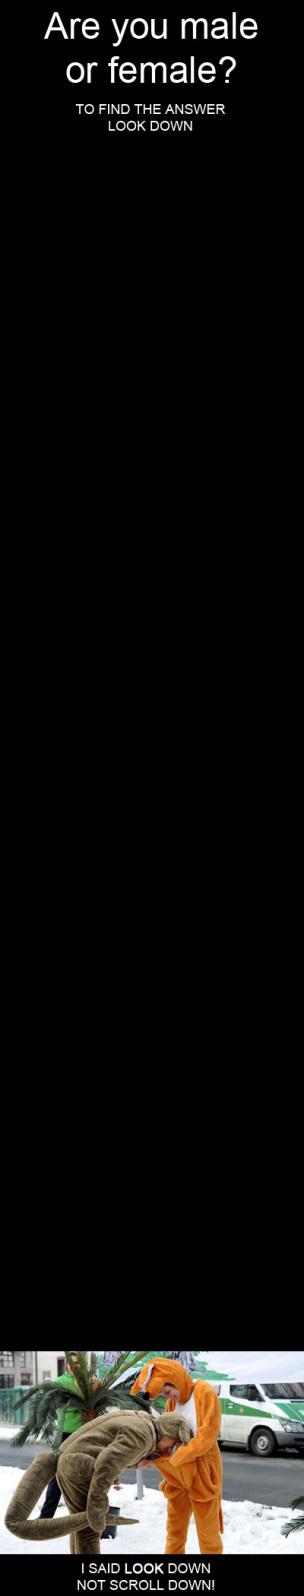 maleorfemale